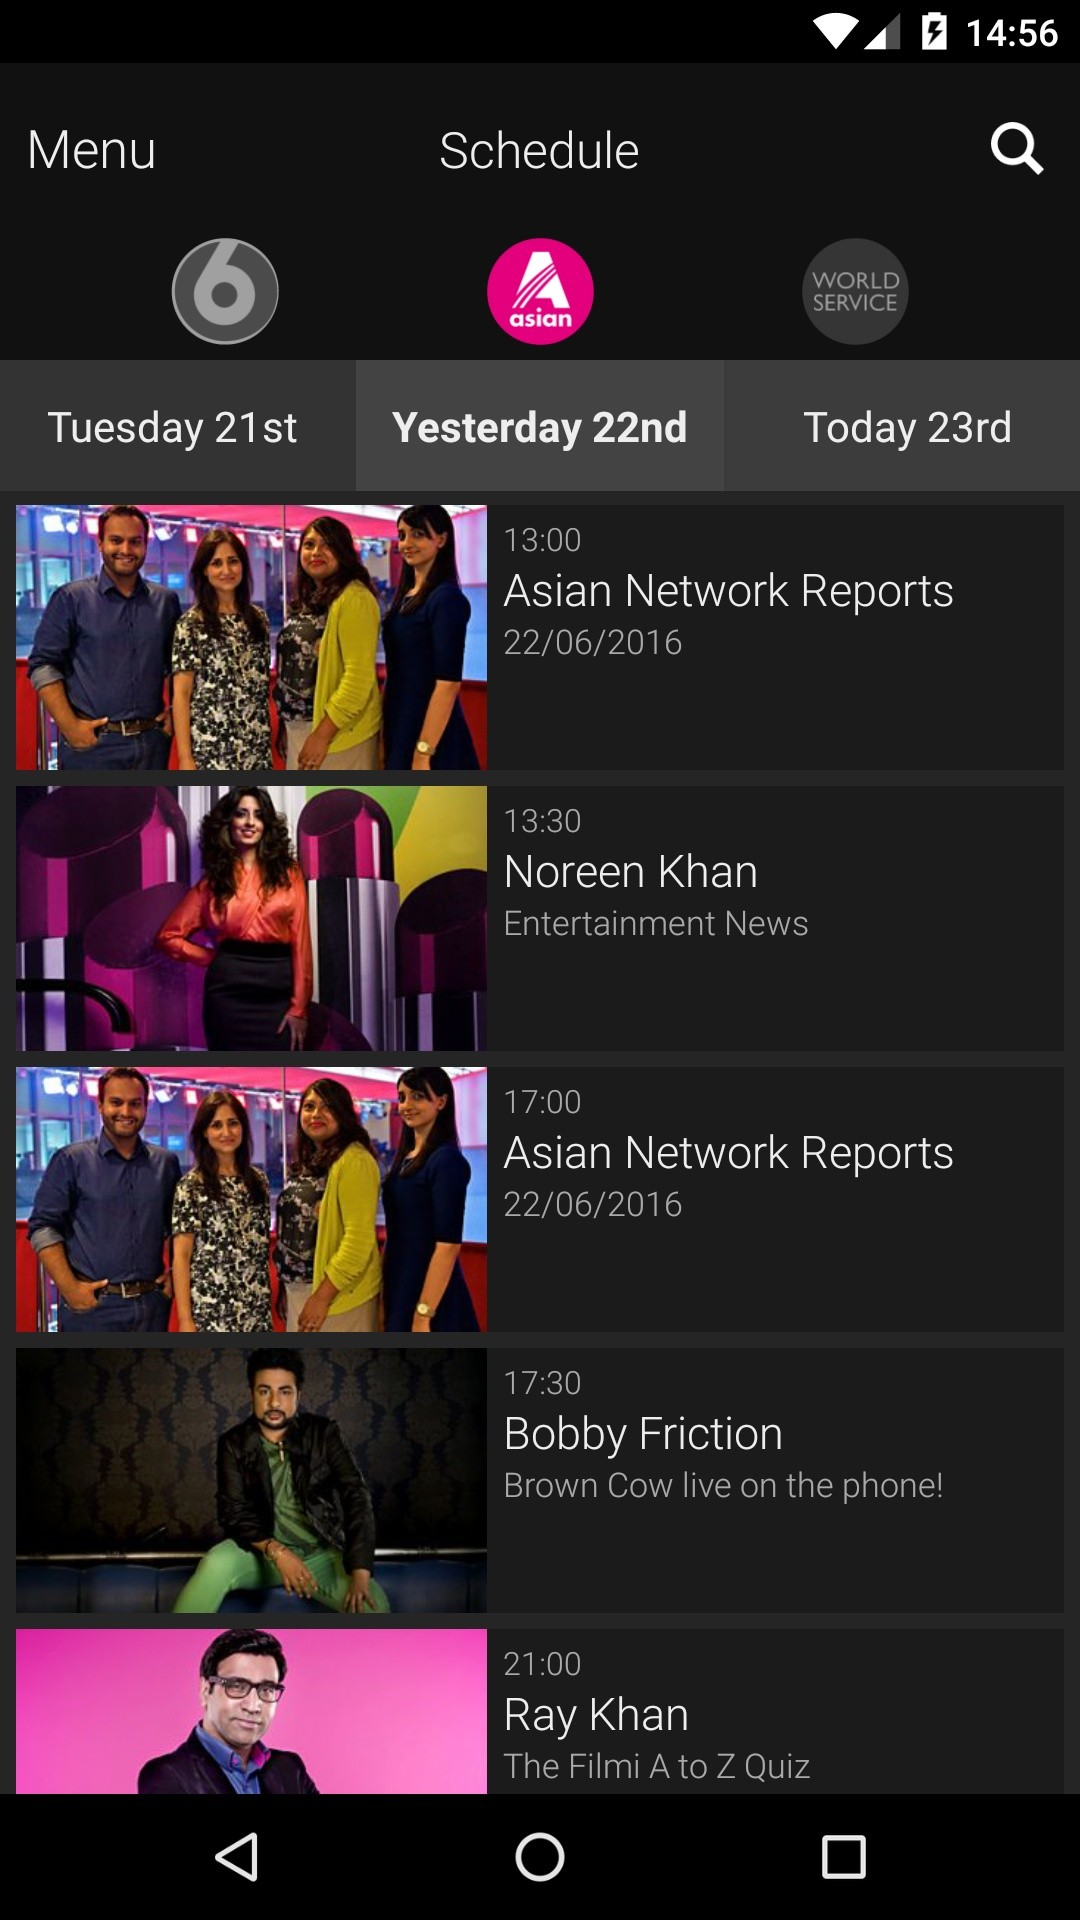 Bbc iplayer radio app apk download | Download BBC iPlayer Radio APK